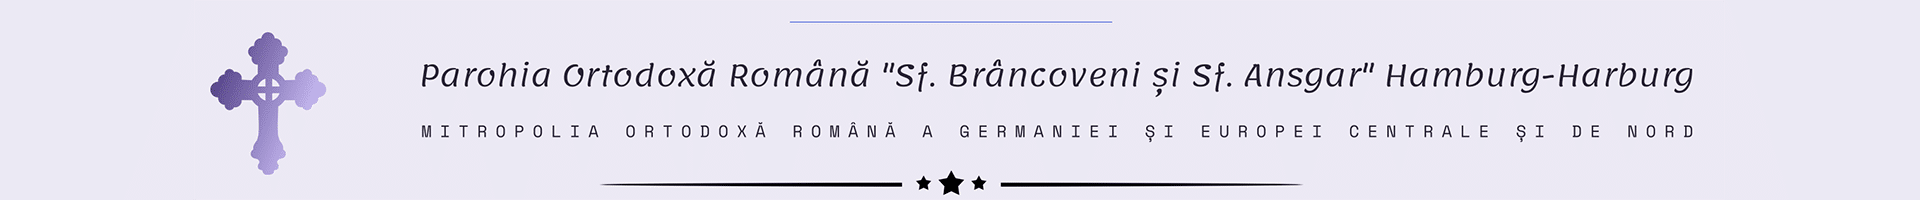 "Parohia Ortodoxă Română ""Sf. Brâncoveni și Sf. Ansgar"" Hamburg-Harburg"